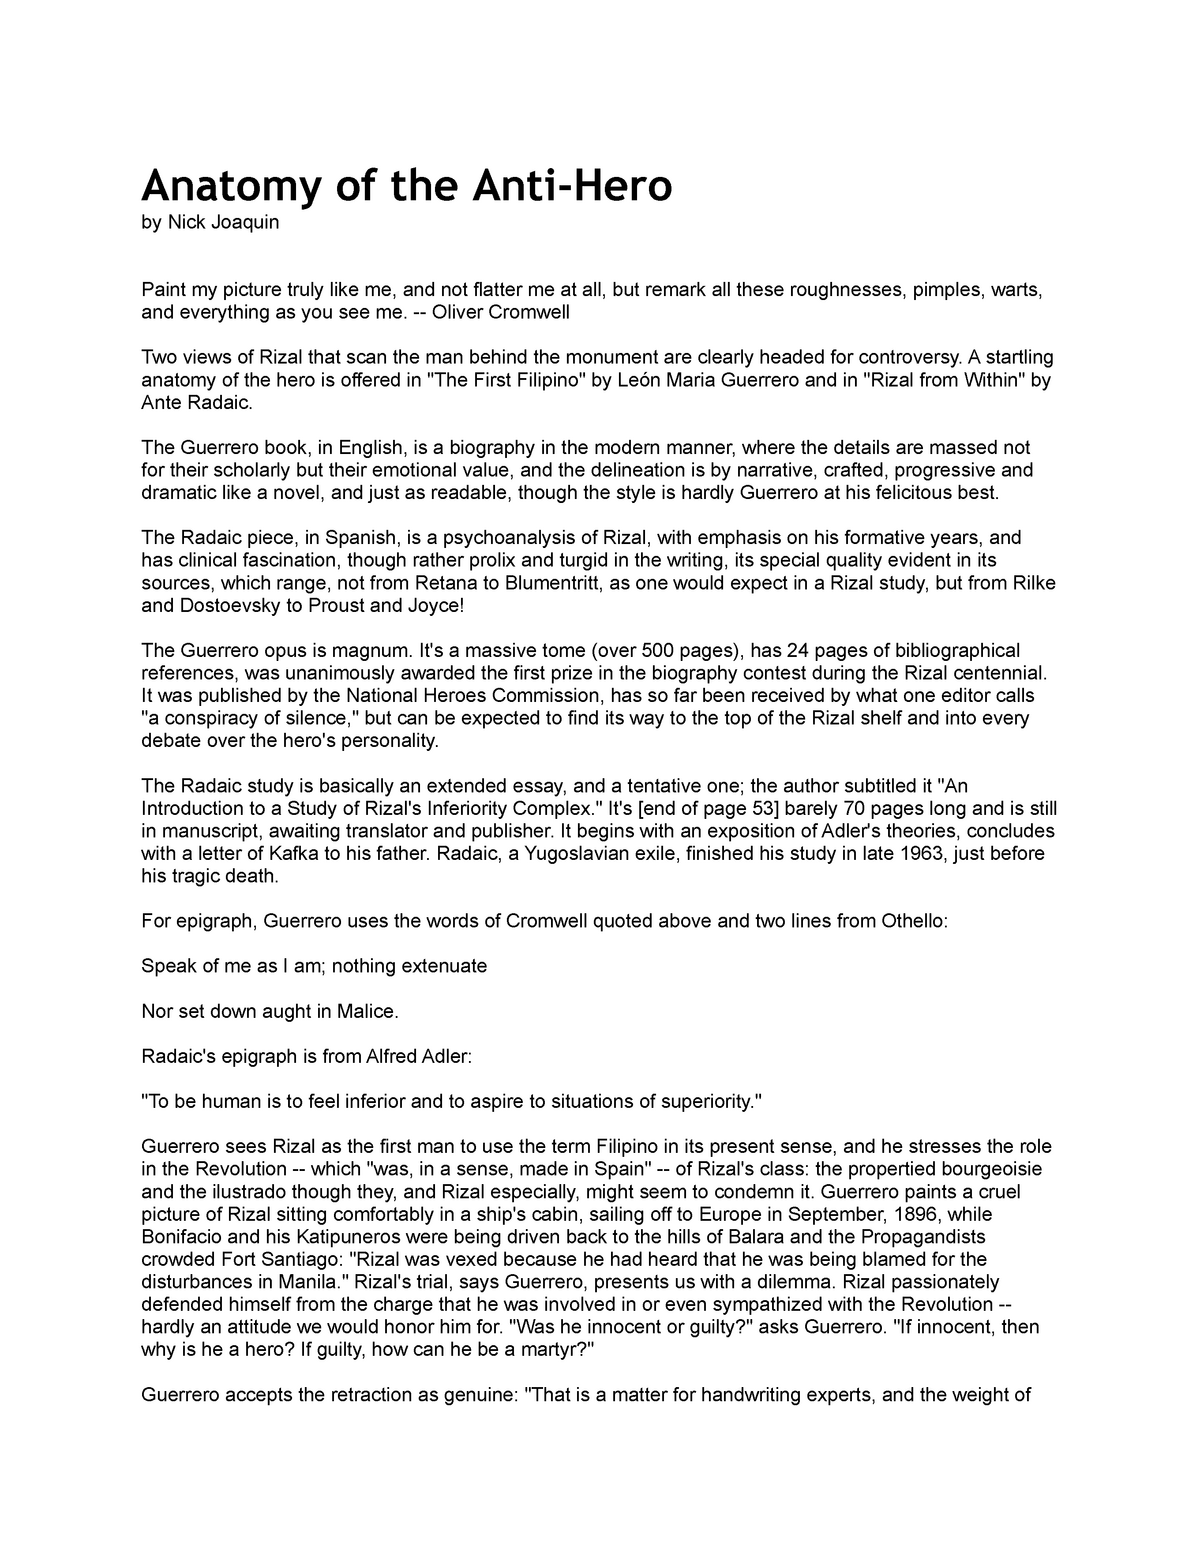 Anatomy of the Anti Hero By Nick Joaquin - GED0102 - StuDocu